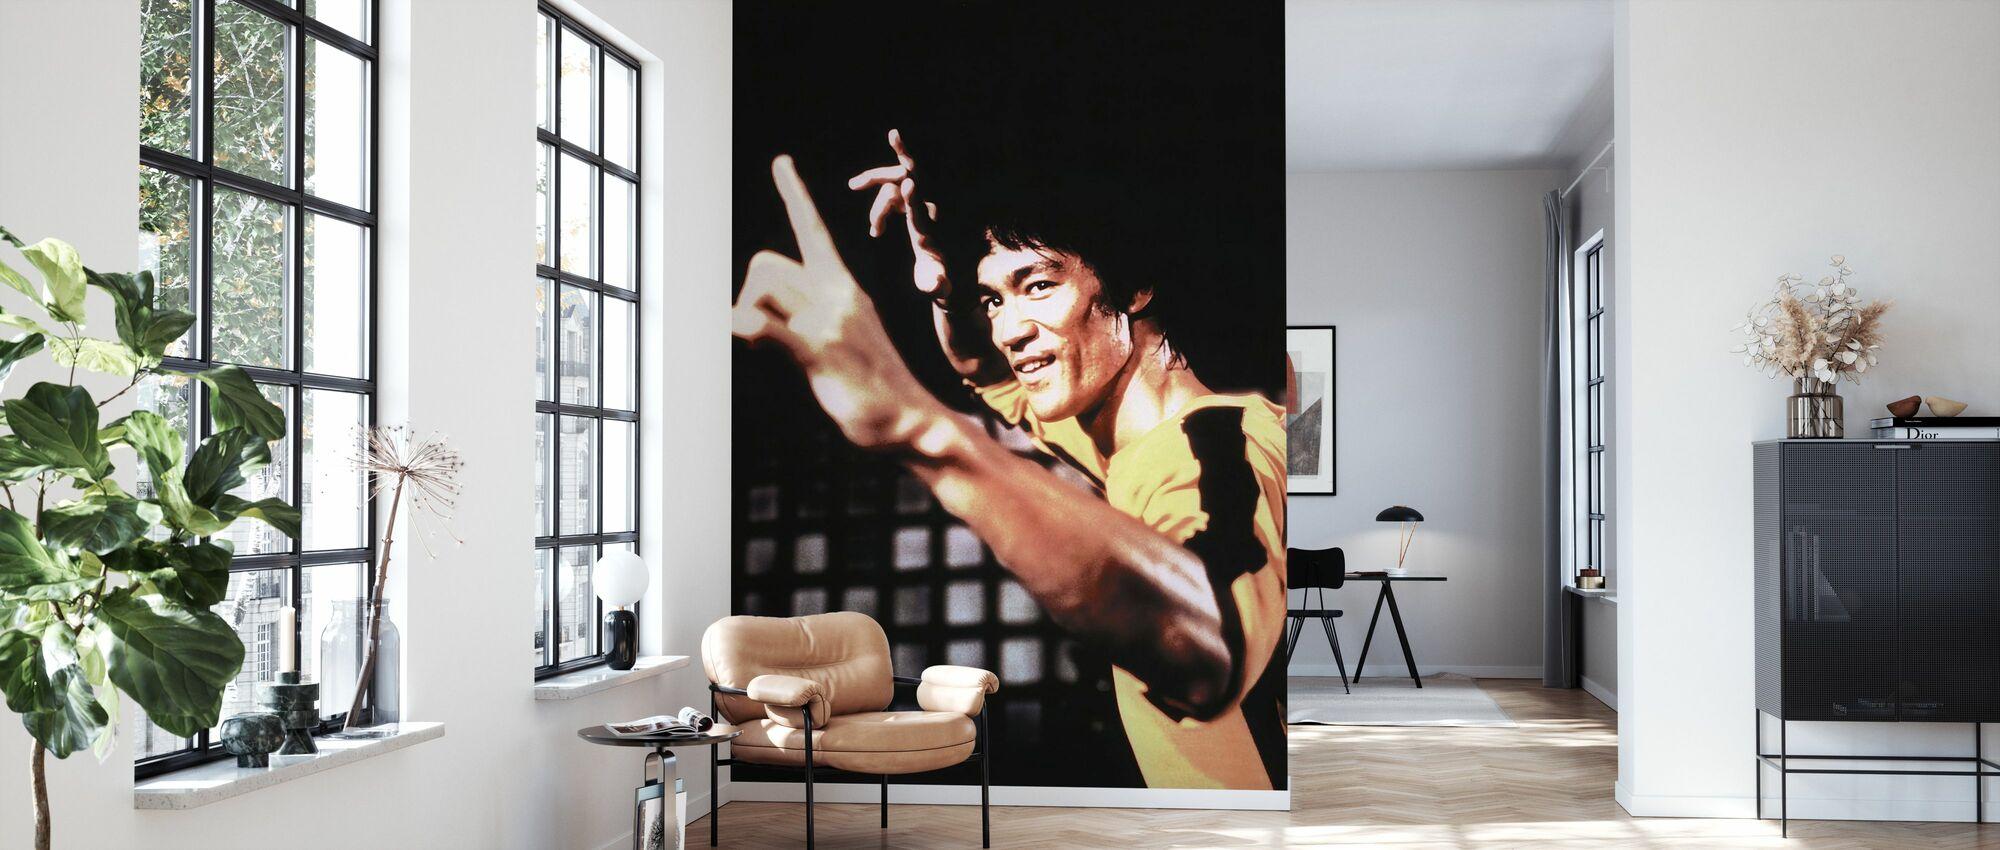 Warriors Journey - Bruce Lee - Wallpaper - Living Room